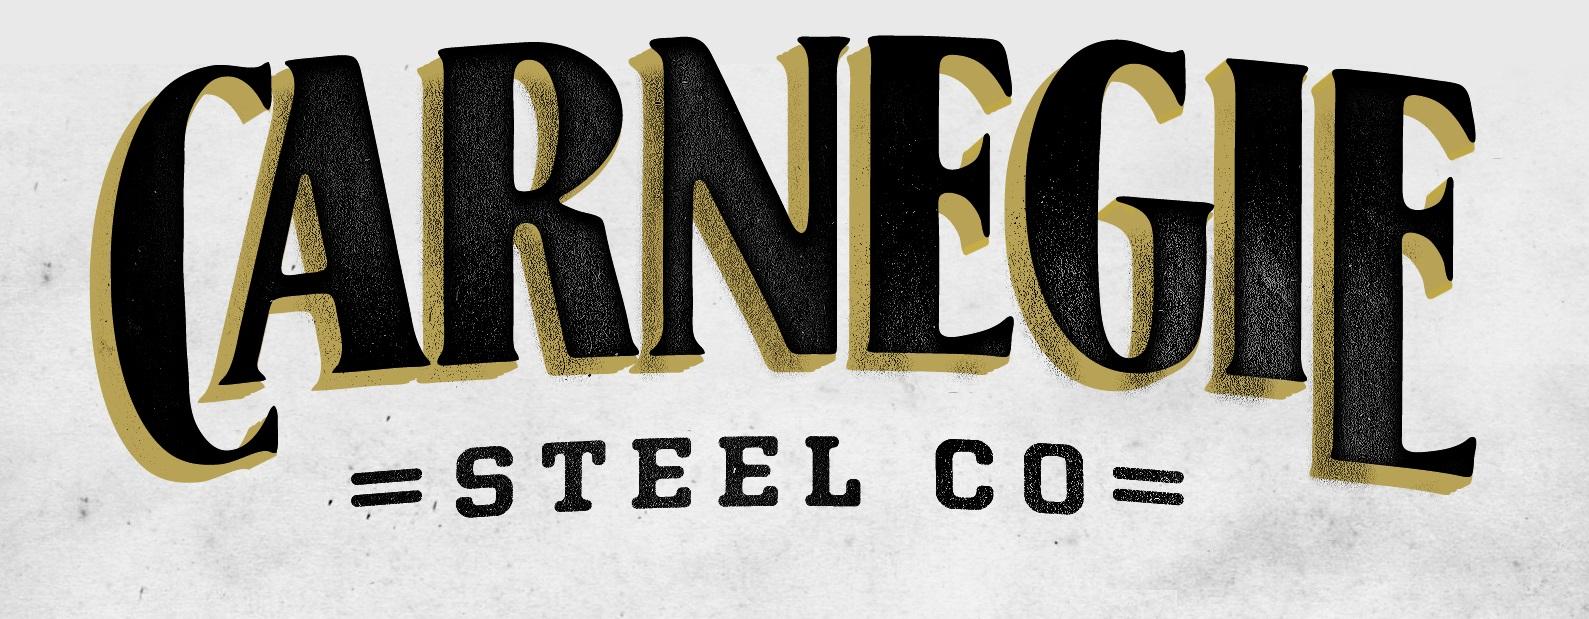 Andrew carnegie steel